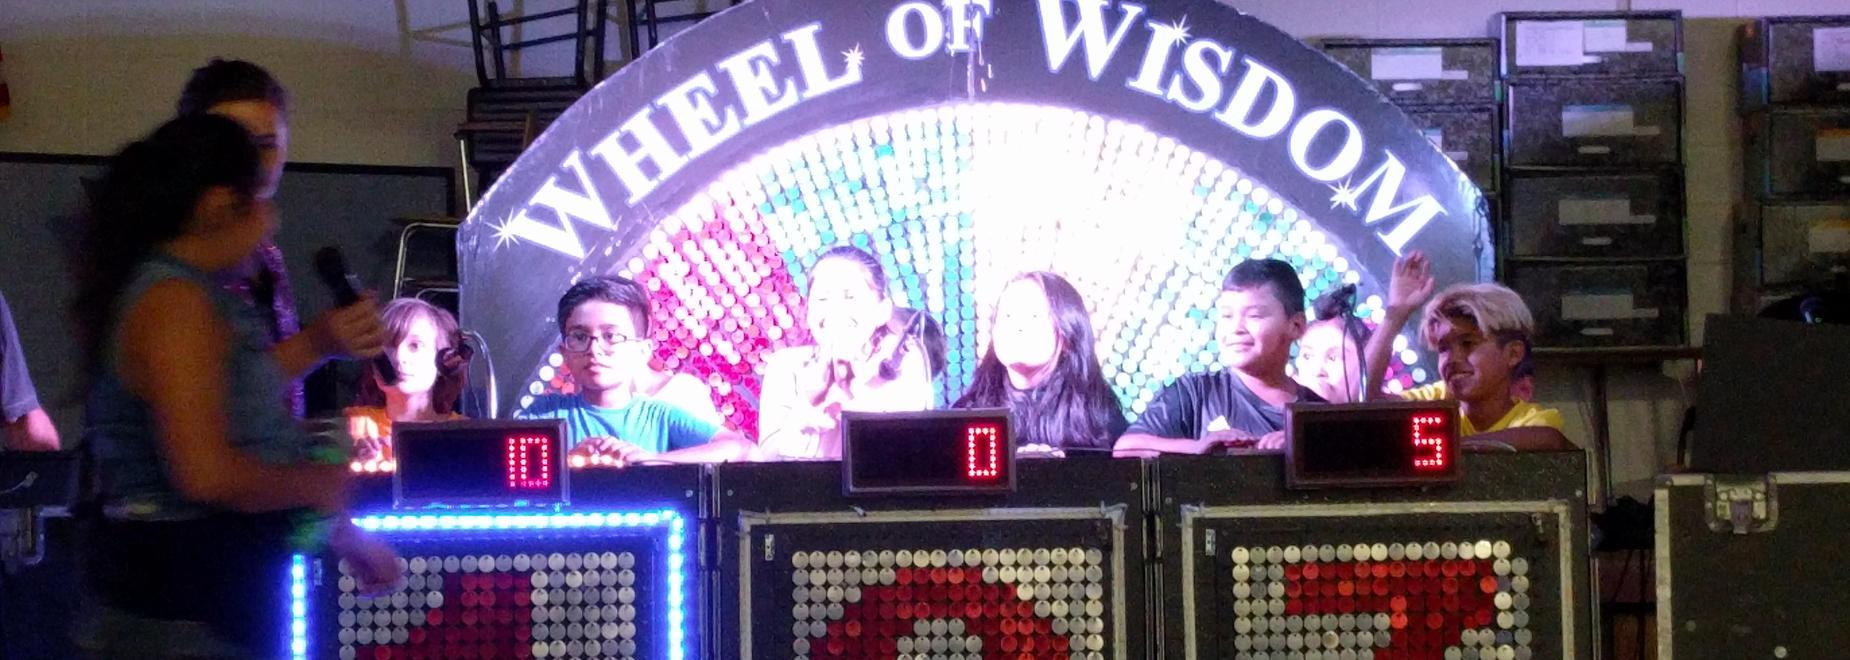 Wheel of Wisdom